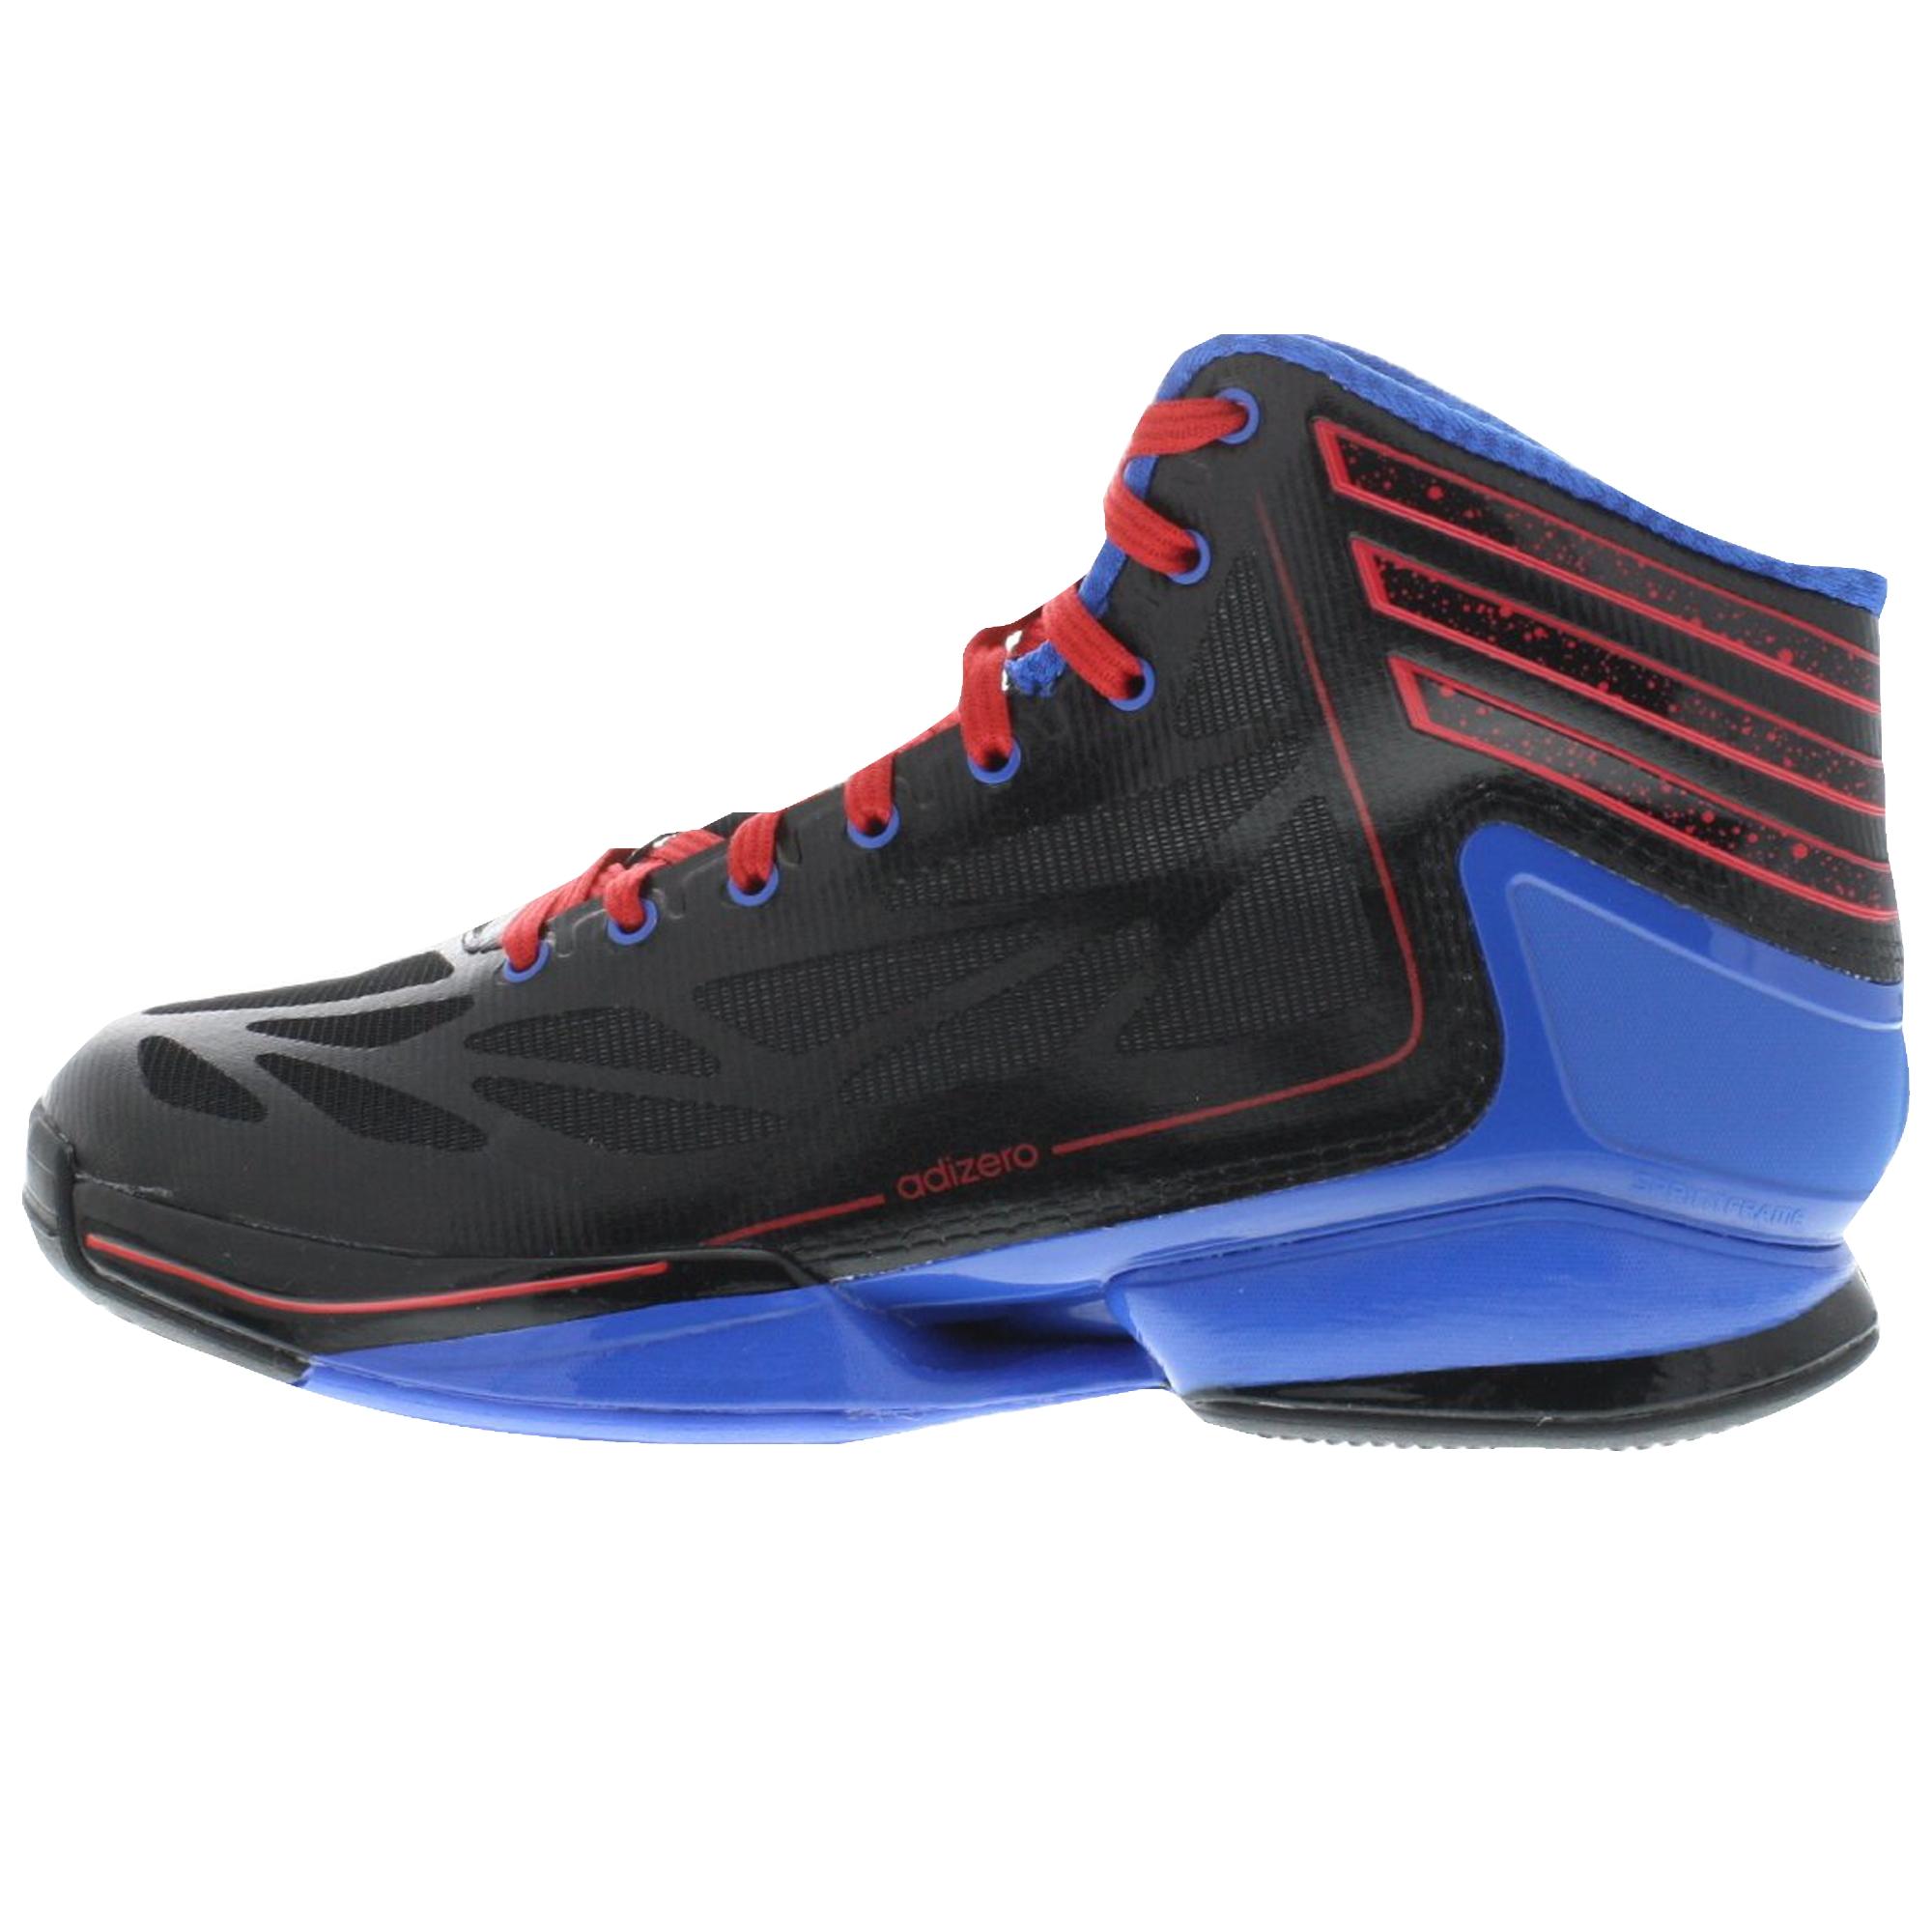 buy online a4308 ad2d7 adidas adiZero Crazy Light 2 Çocuk Basketbol Ayakkabısı